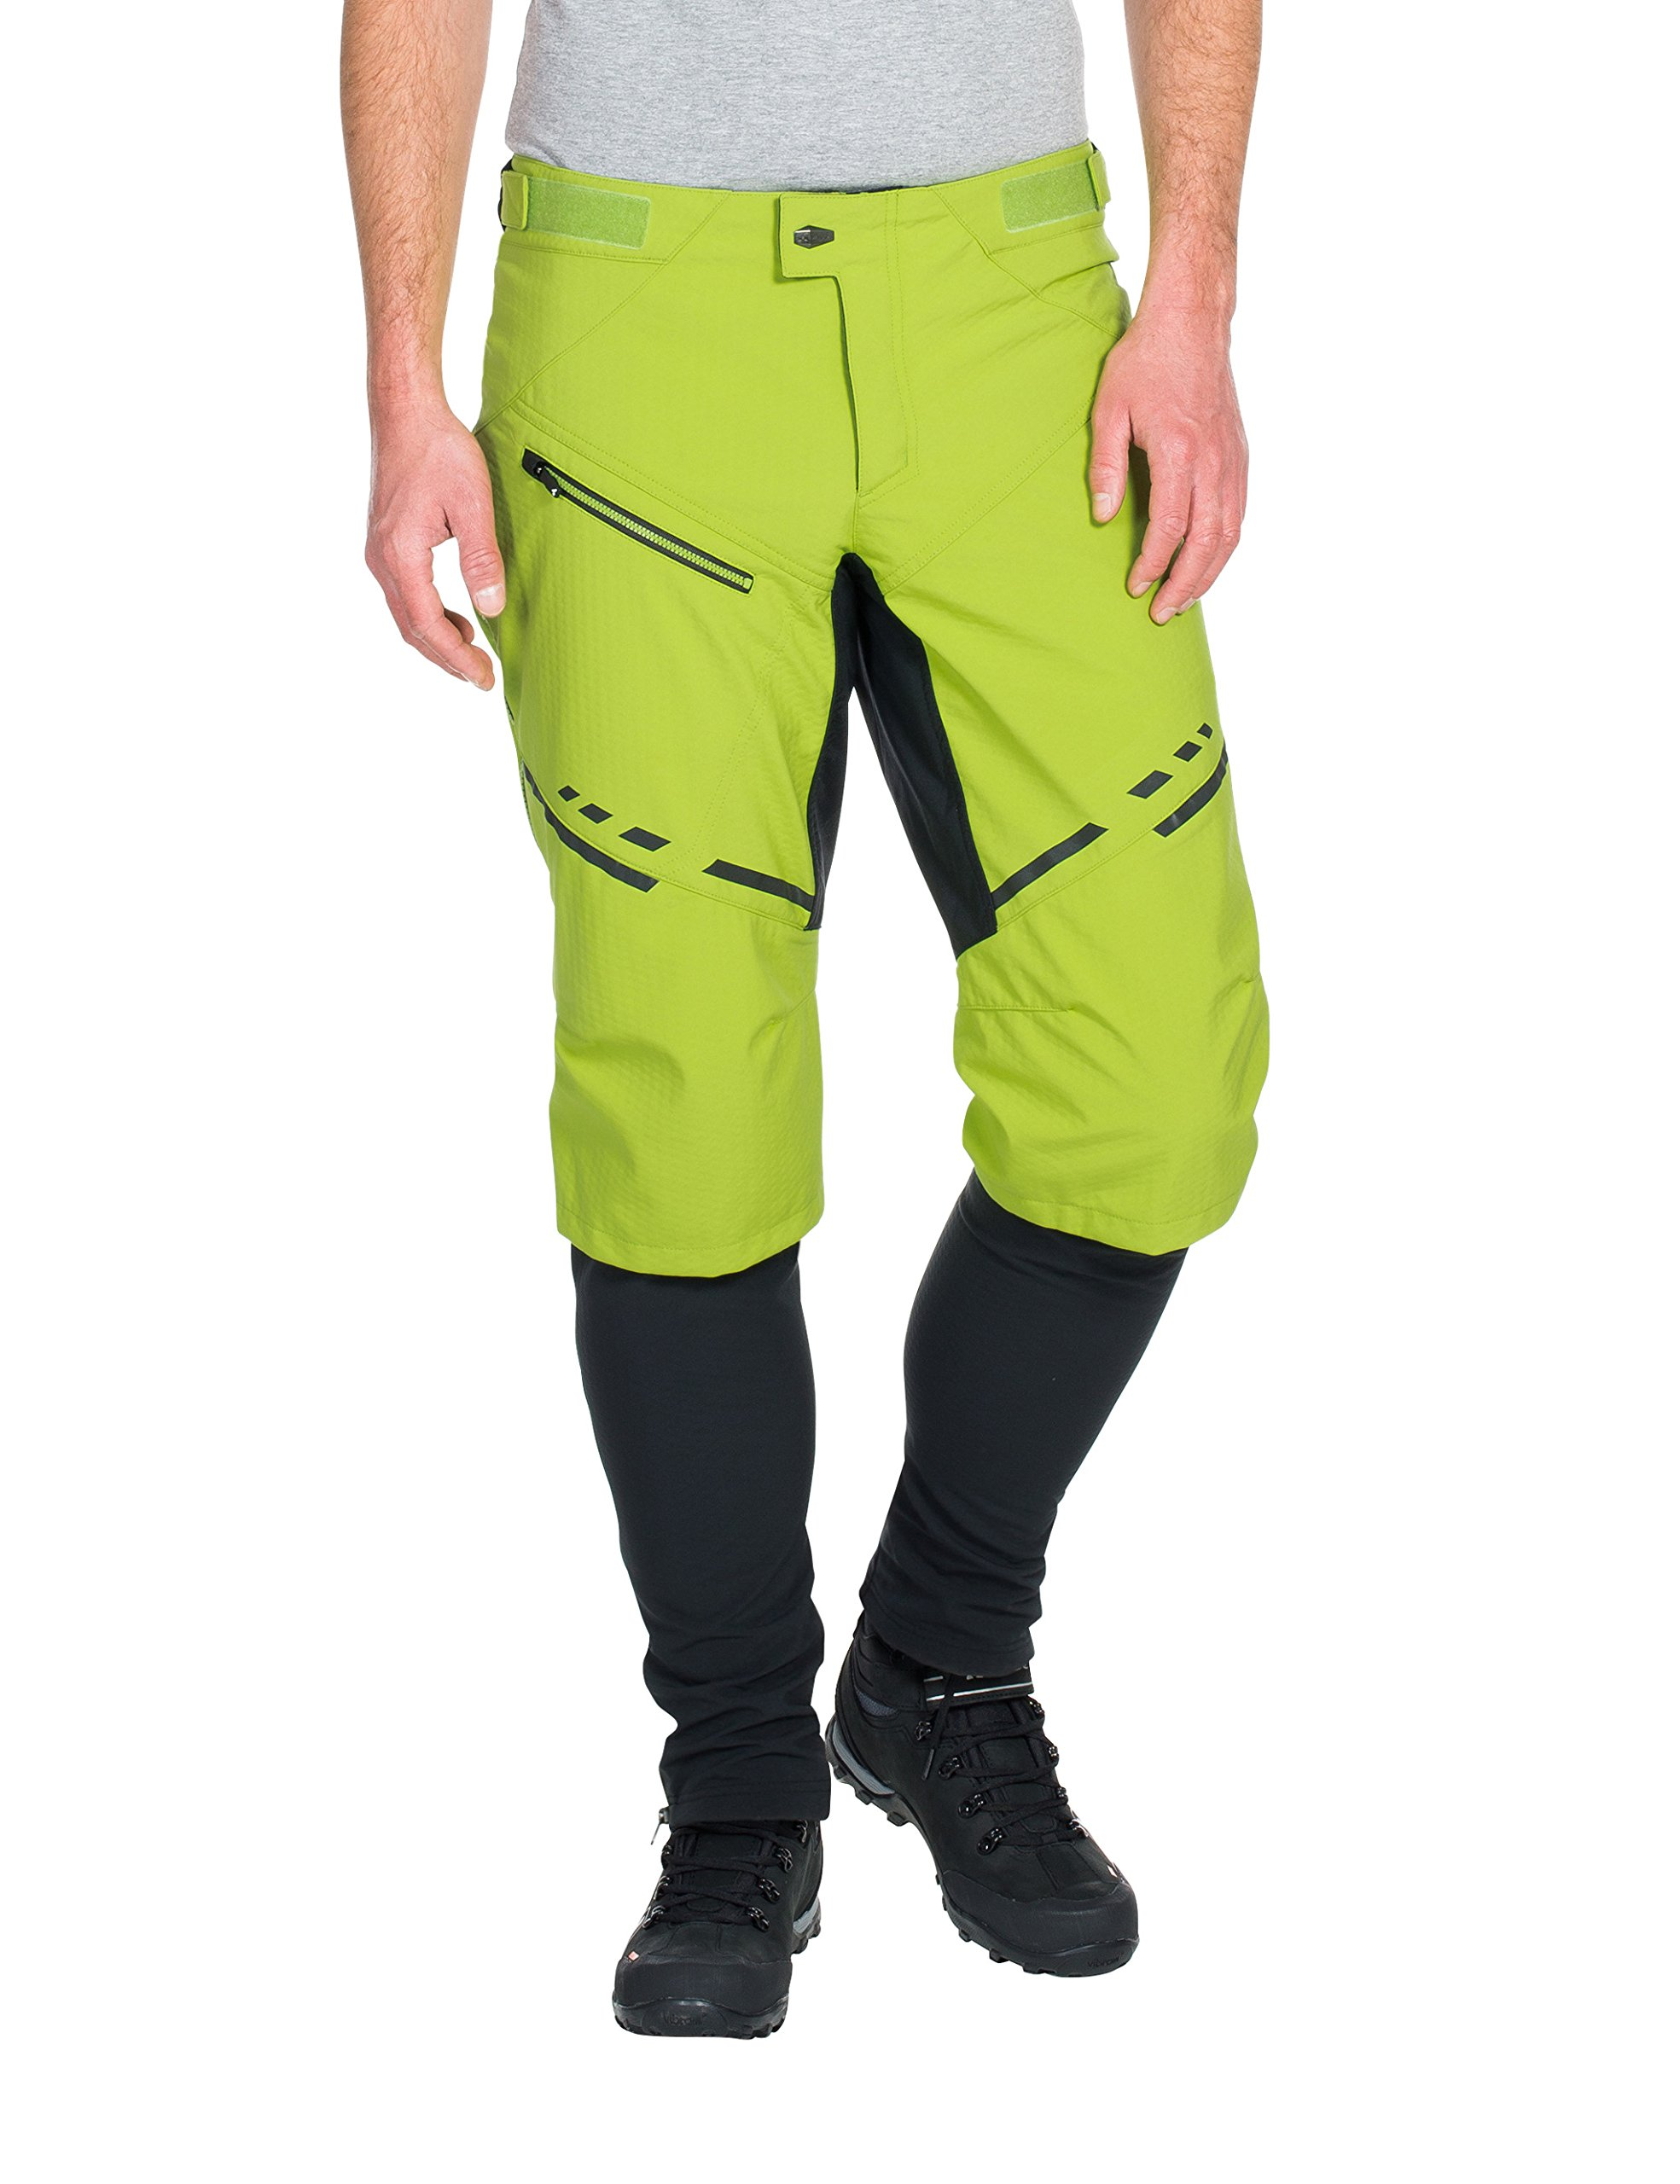 VAUDE Men's Virt Softshell II Pants, X-Large, Pistachio